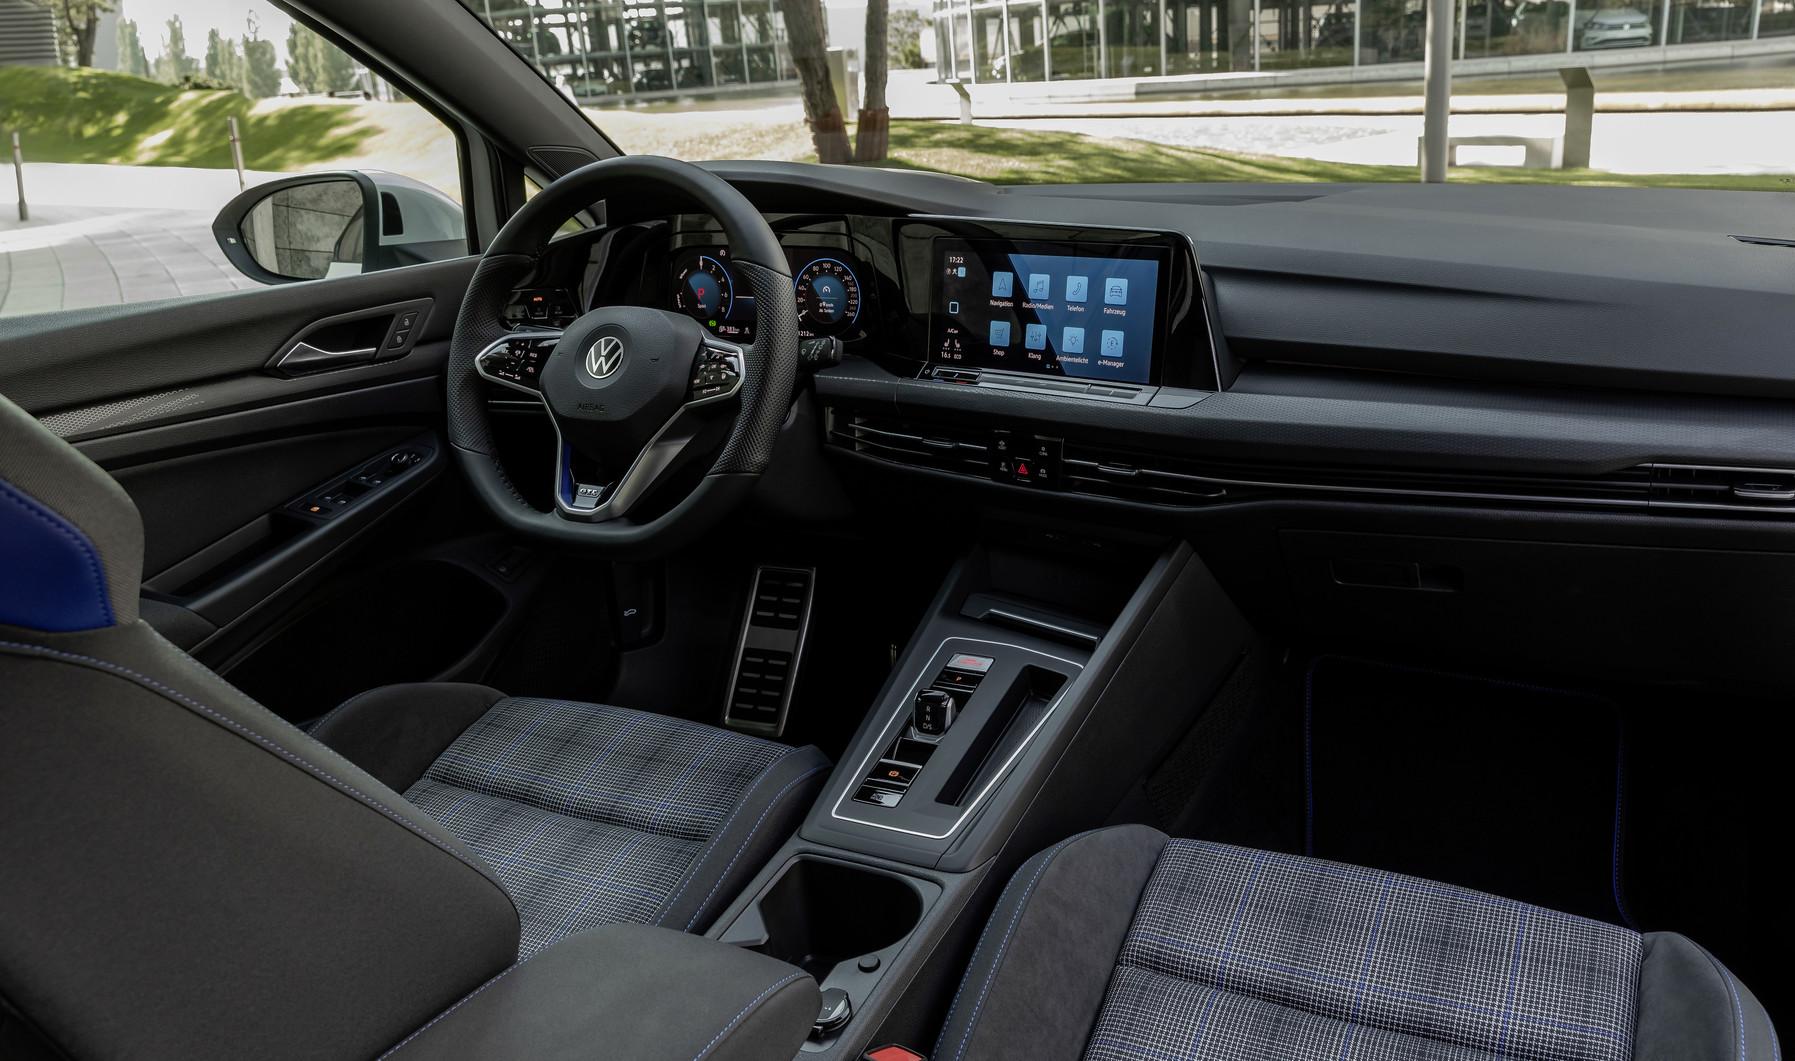 VW GOLF GTE 9